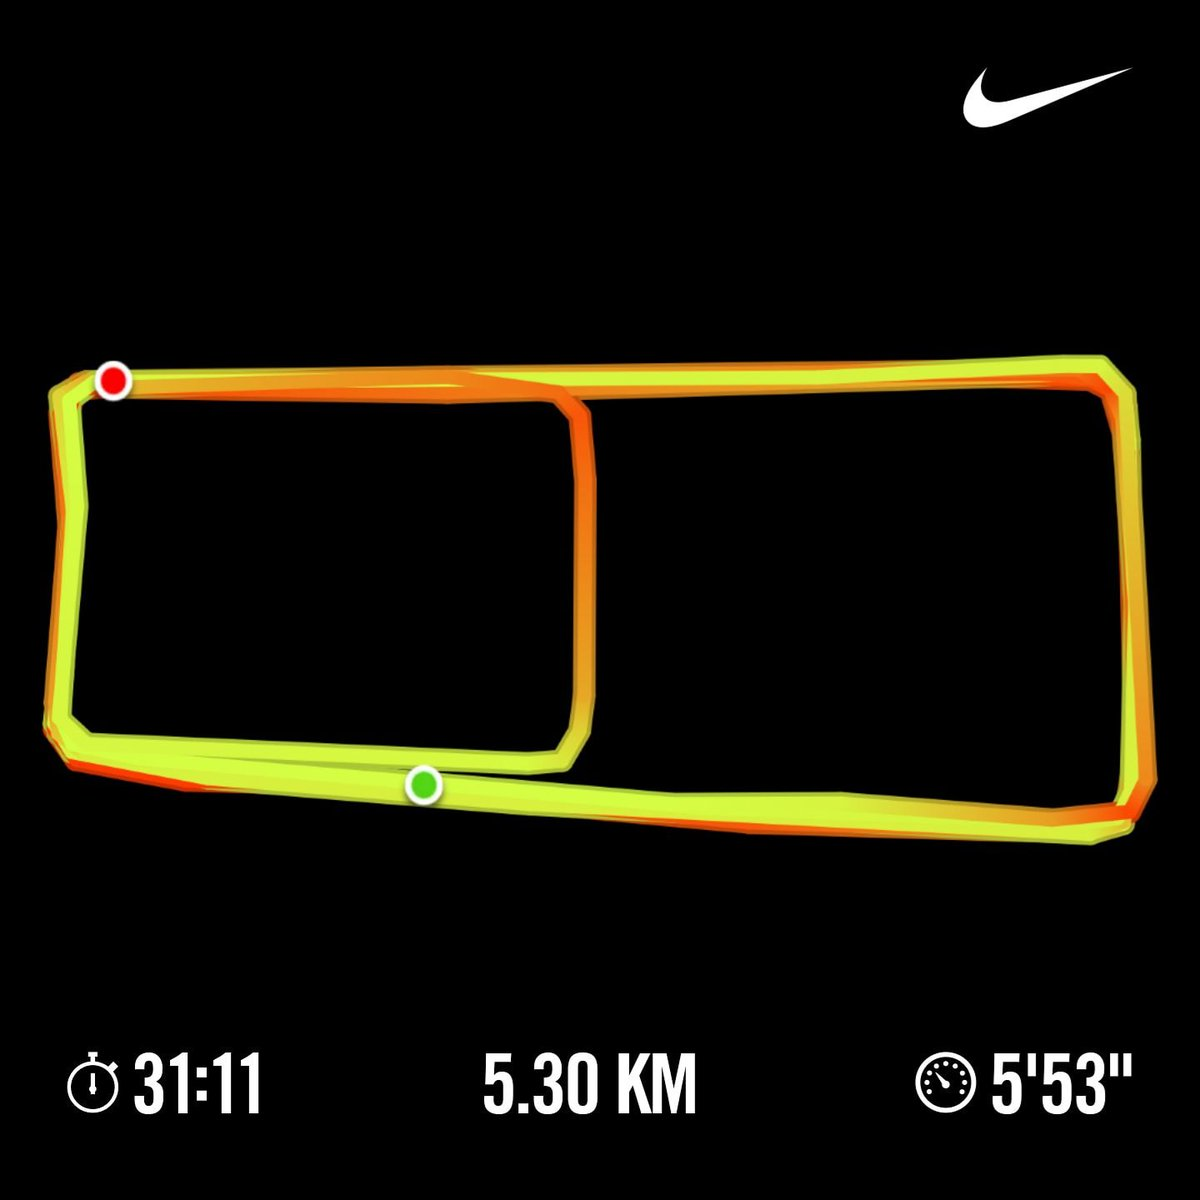 5.30km completed.  We mooooveee.   #naijaFittest #runner #nikeplus #fitfam #strava #GoogleFit #itsAmarathon #ItsALifestyle #IamAccountable #yourturn   👌🏃♂️💪✅🇳🇬🔥✌